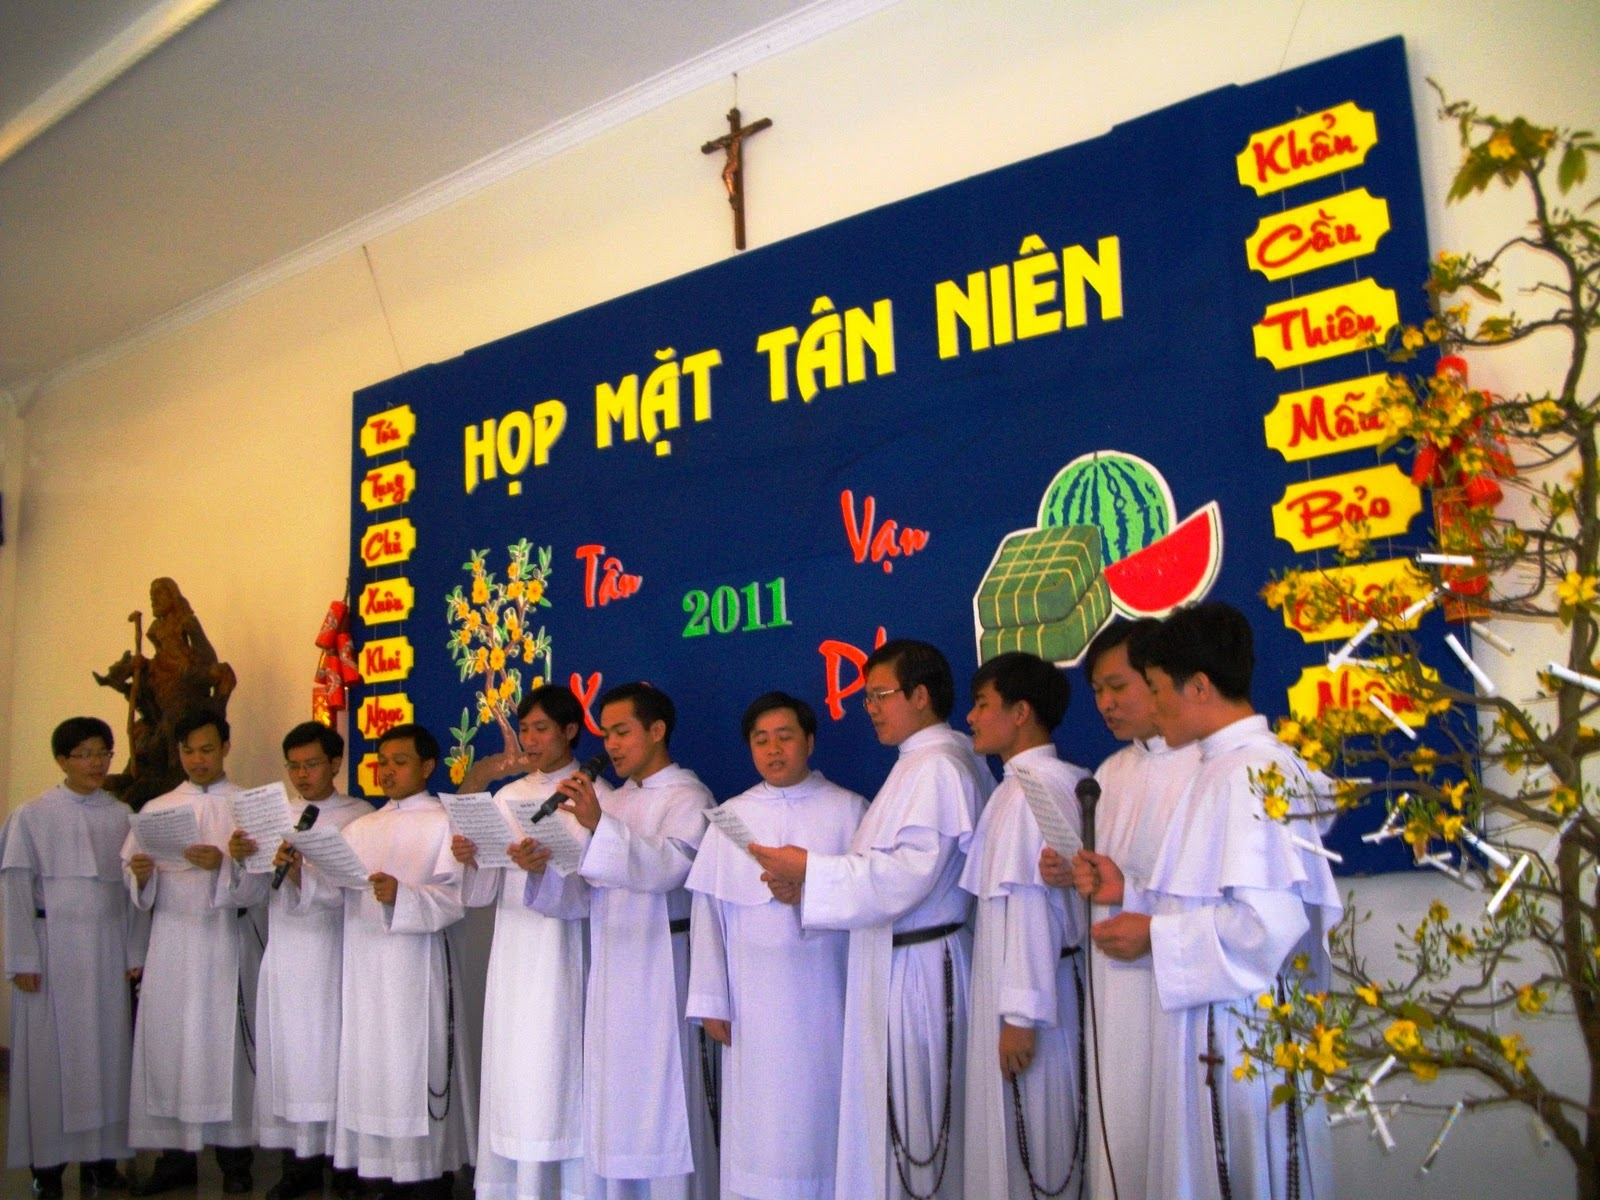 L 234 T 226 N Tu Vien Da Minh Ho Nai Gap Go Than Nhan Quy Tu